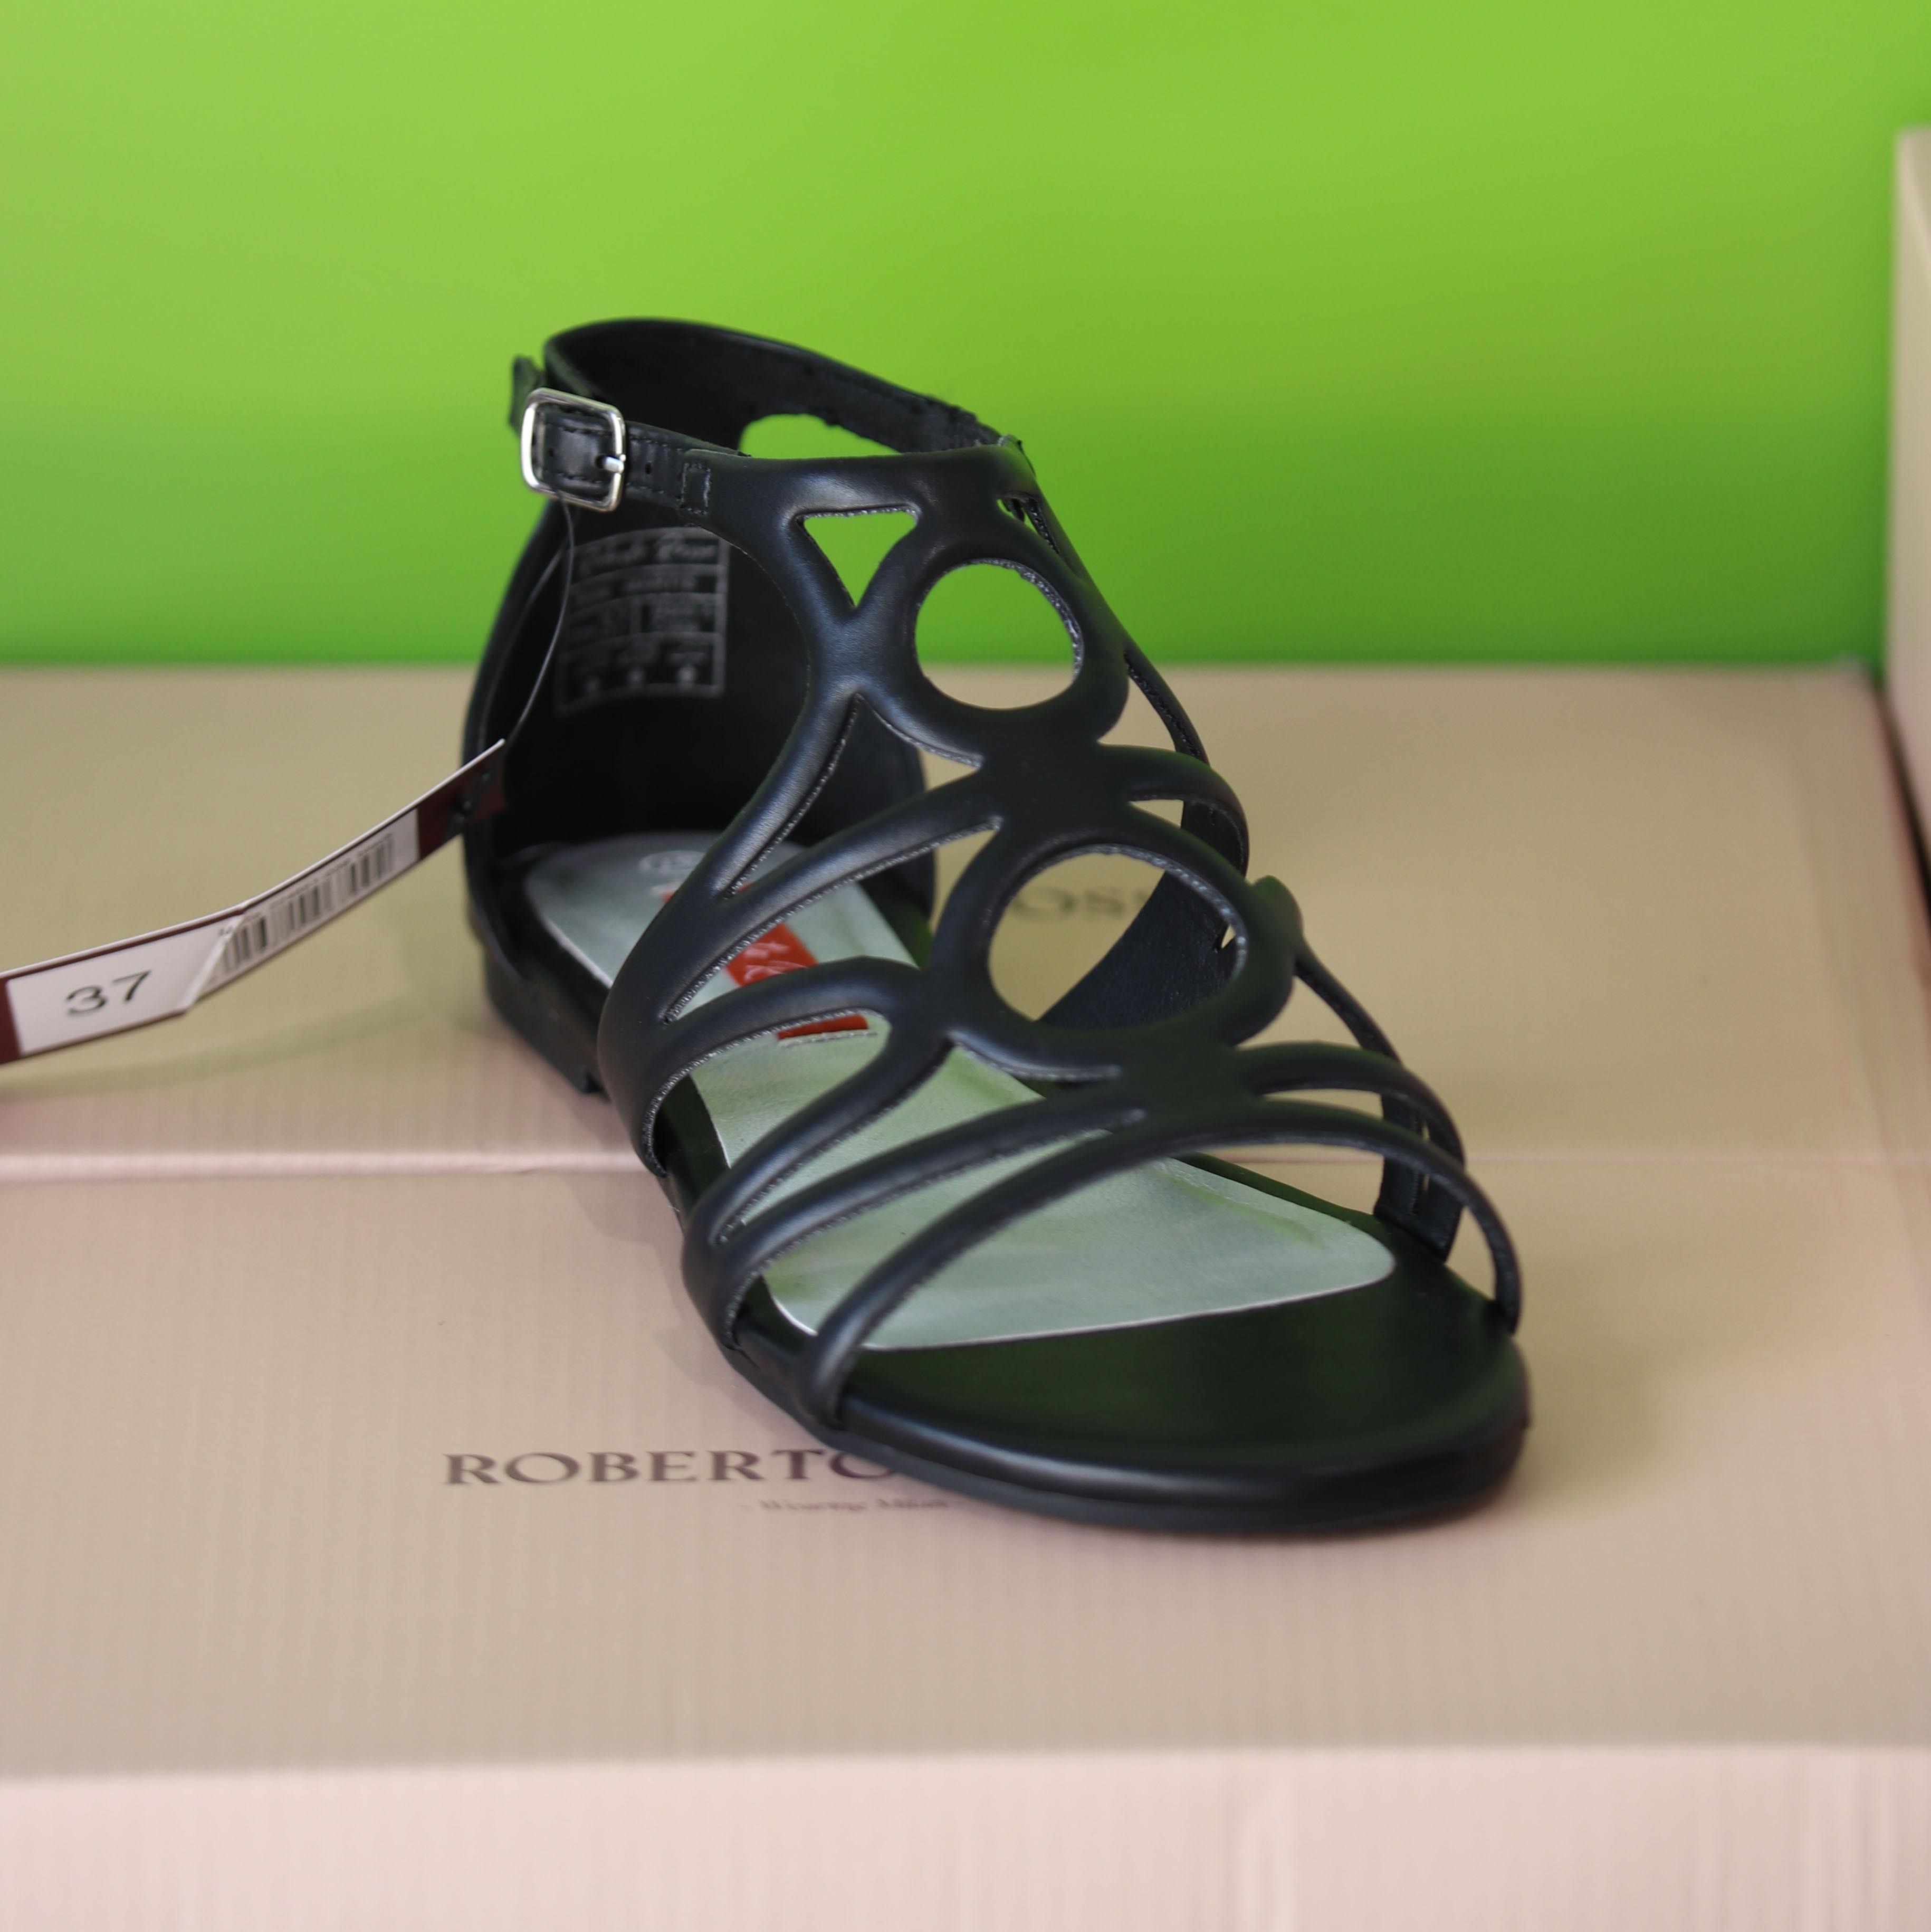 roberto rosso – martis sort sandal dame2